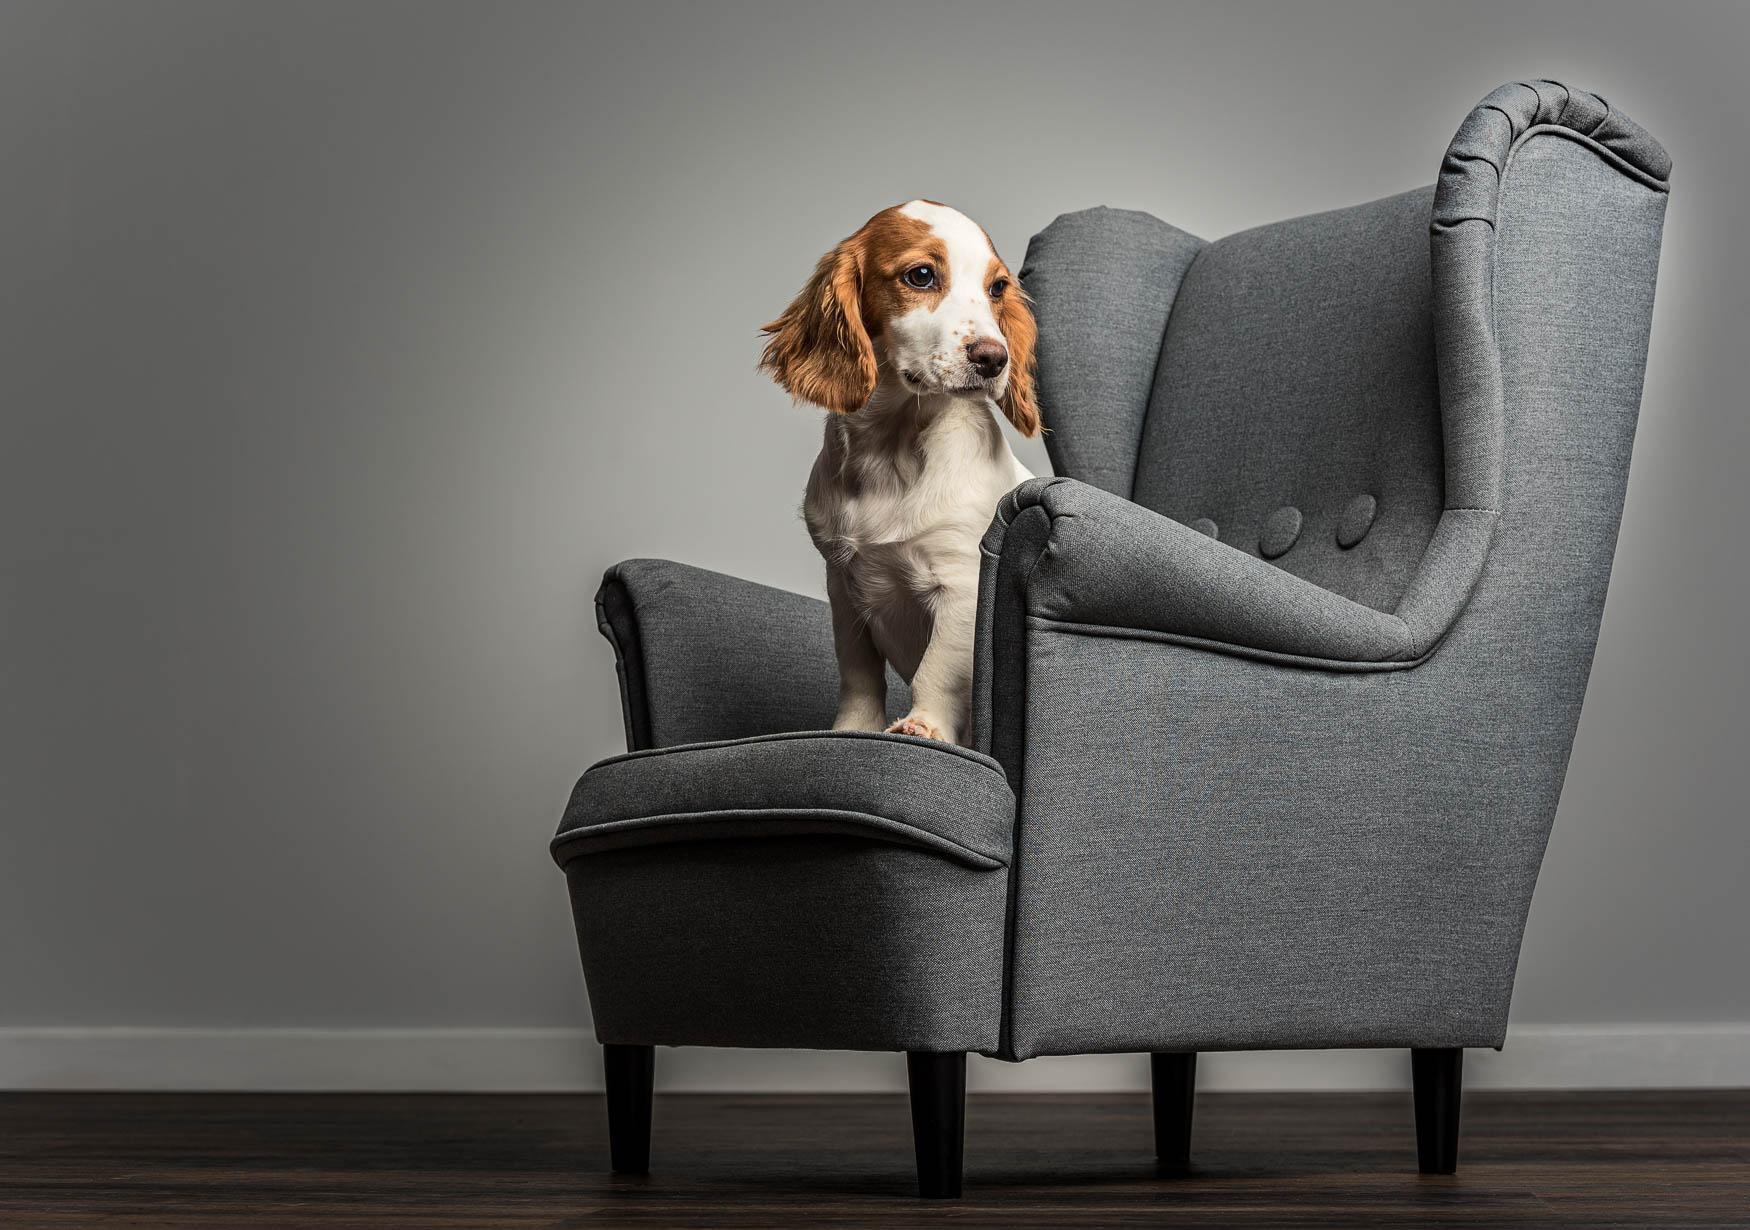 Studio fine art dog photographer Cheshire - Cockapoo puppy